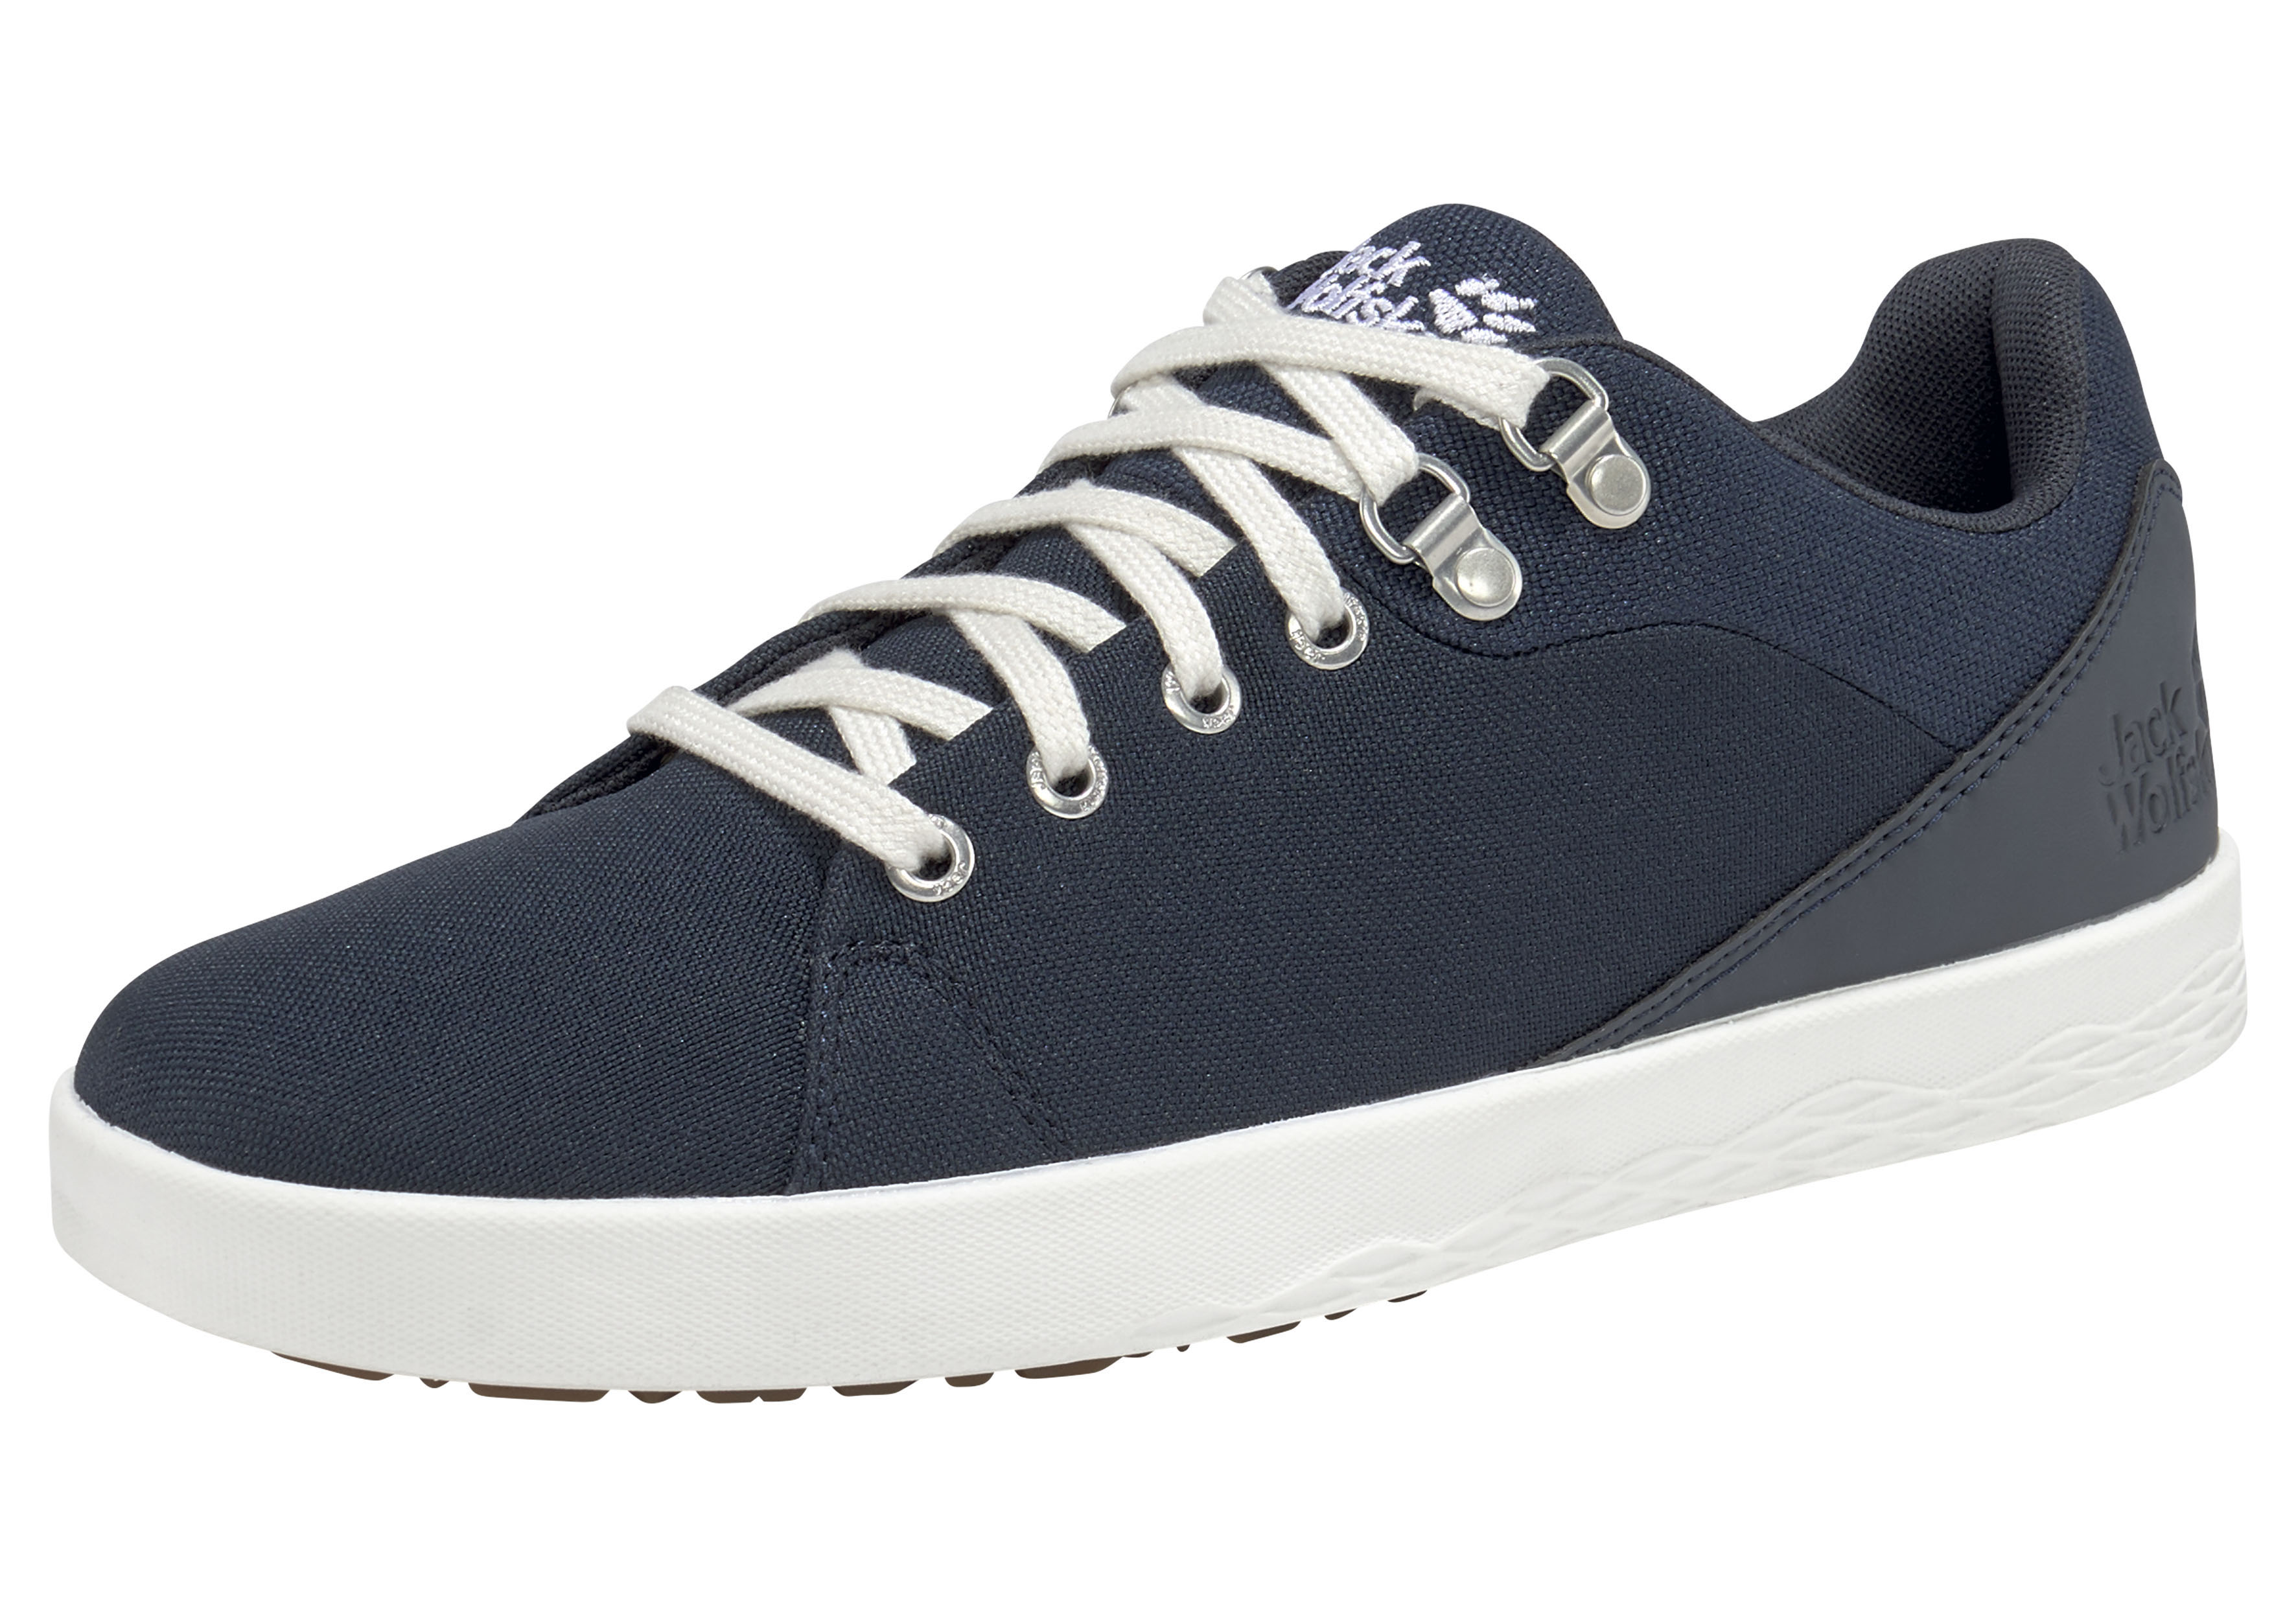 Jack Wolfskin Sneaker AUCKLAND RIDE LOW M